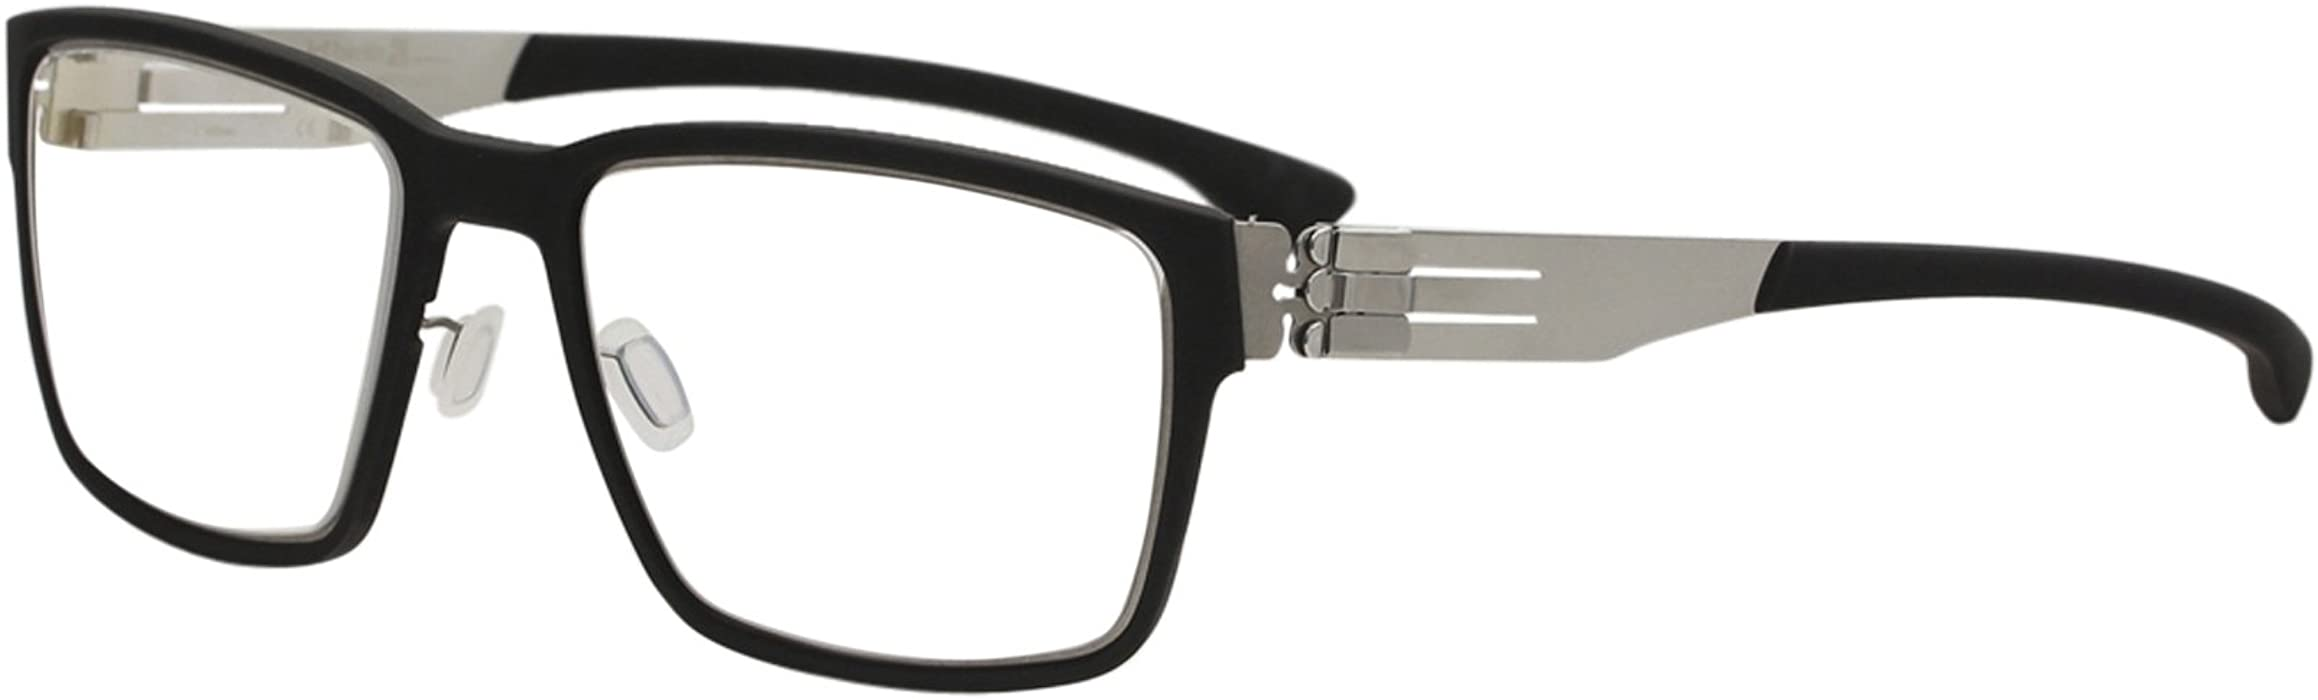 e58787d964 Amazon.com  Ic! Berlin Eyeglasses Nino S. Black Rubber Chrome Full Rim  Optical Frame 53mm  Clothing